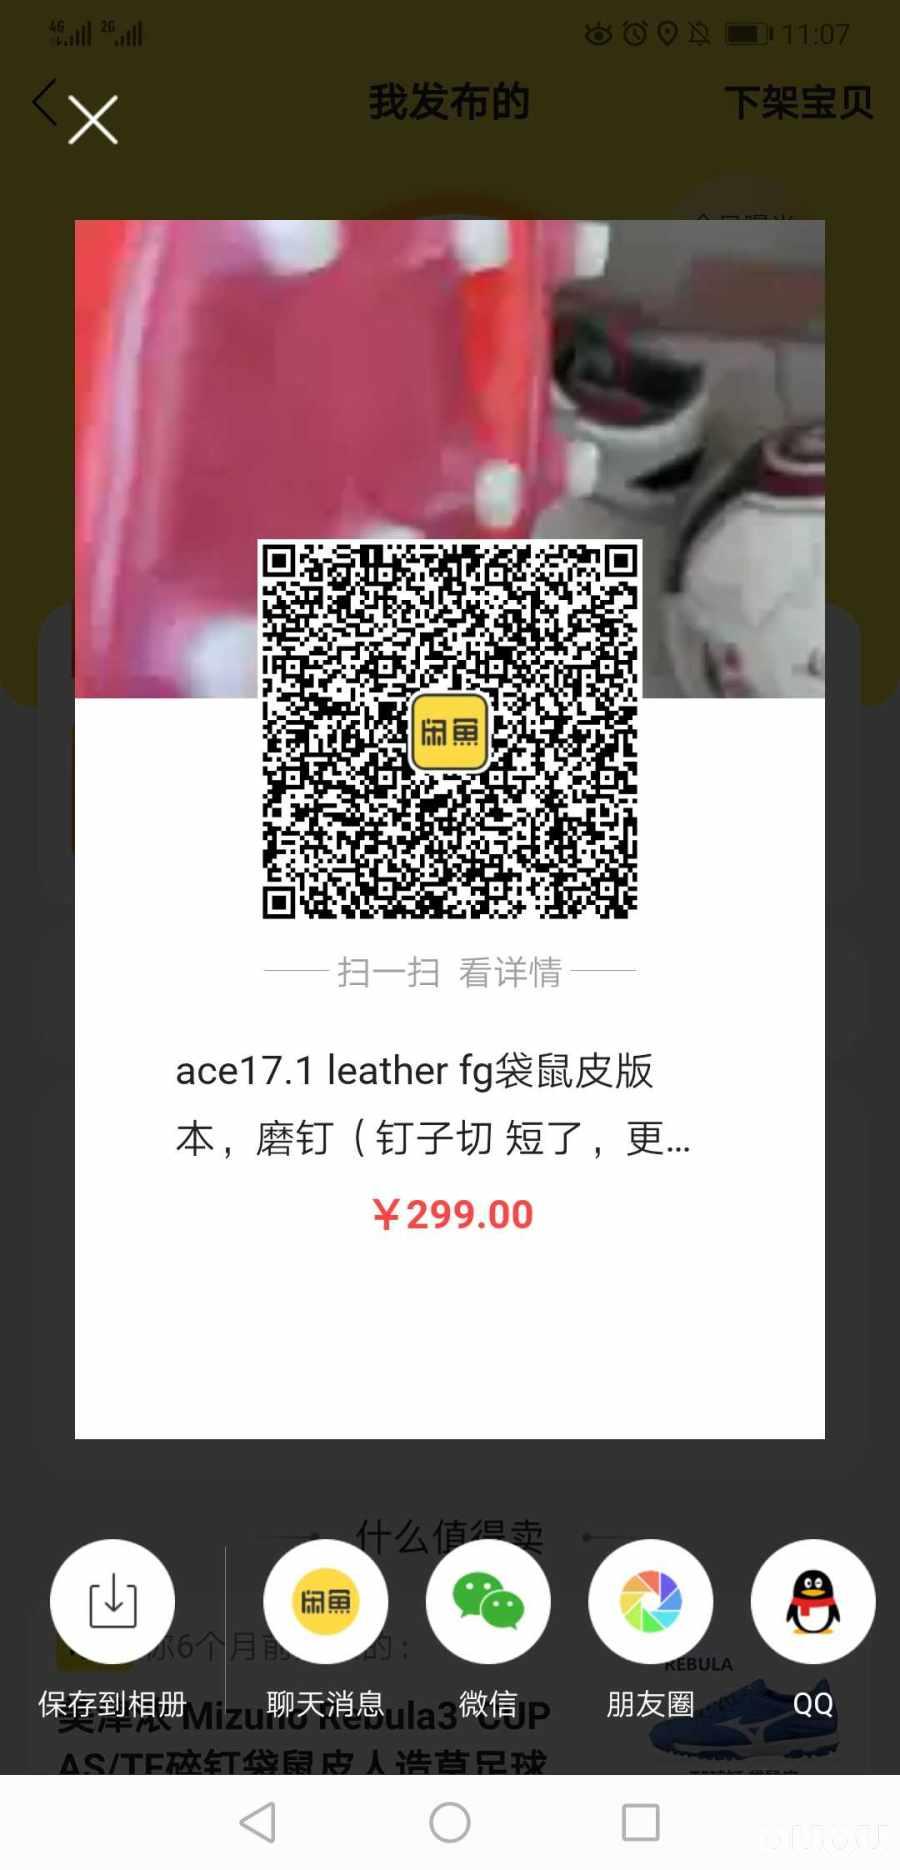 ace17.1 leather fg袋鼠皮版本